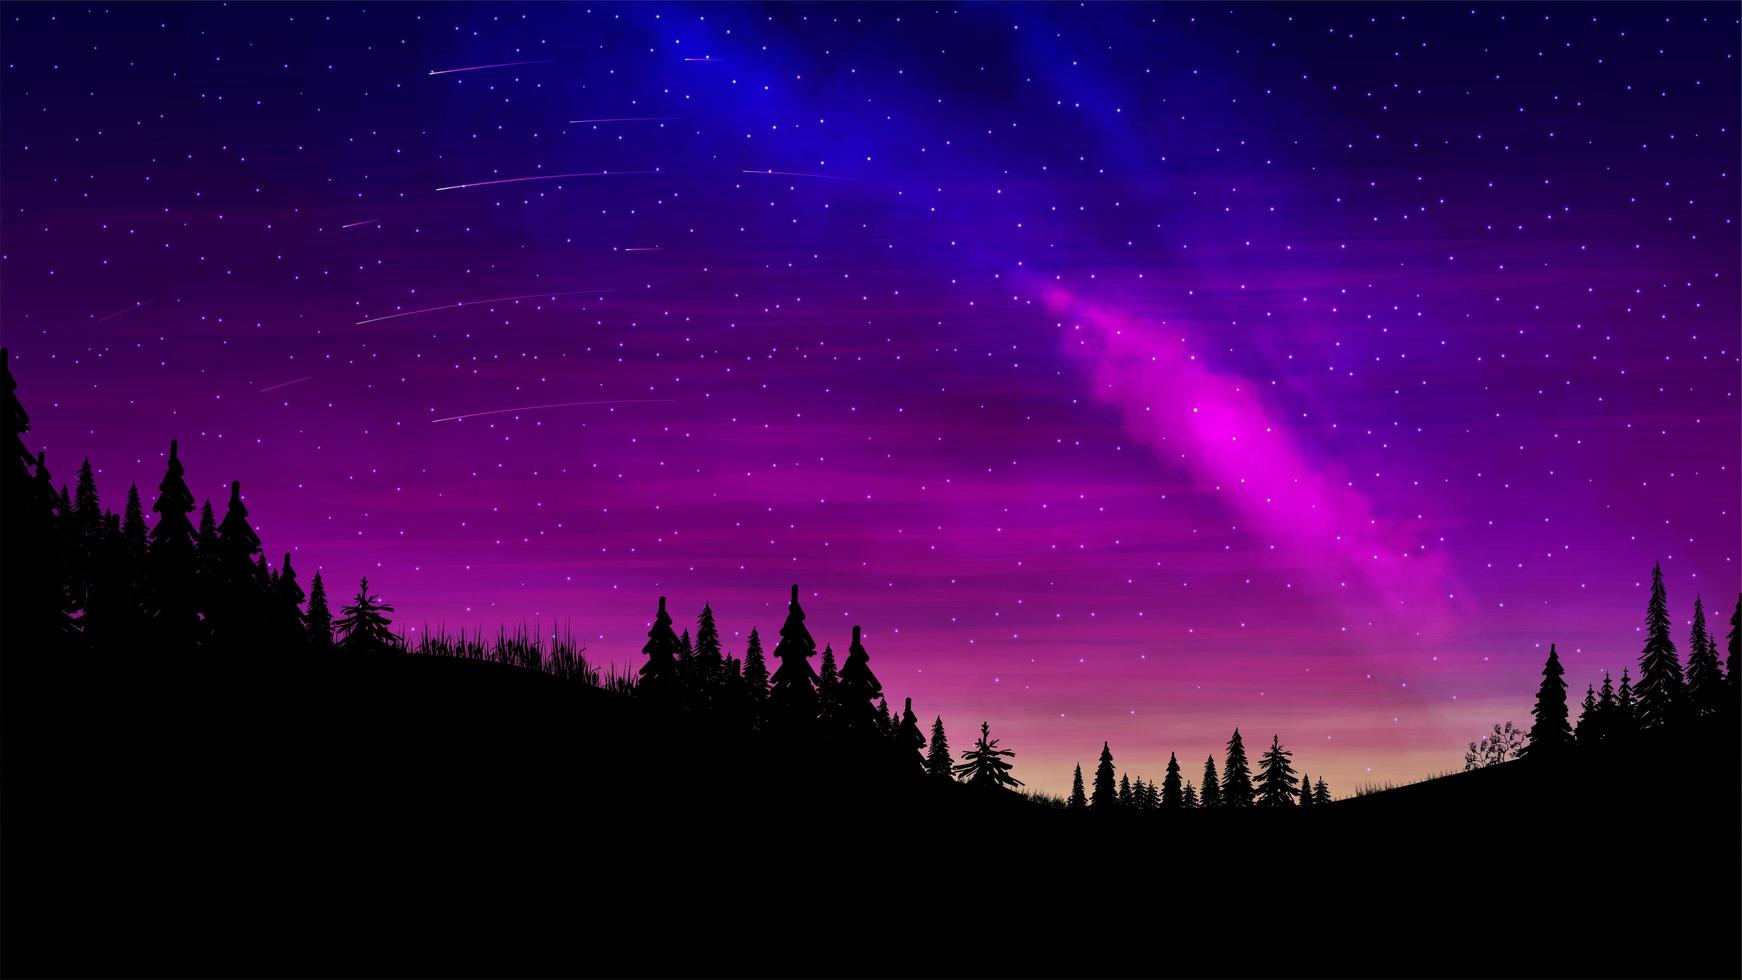 paarse dennenbos landschap 's nachts vector